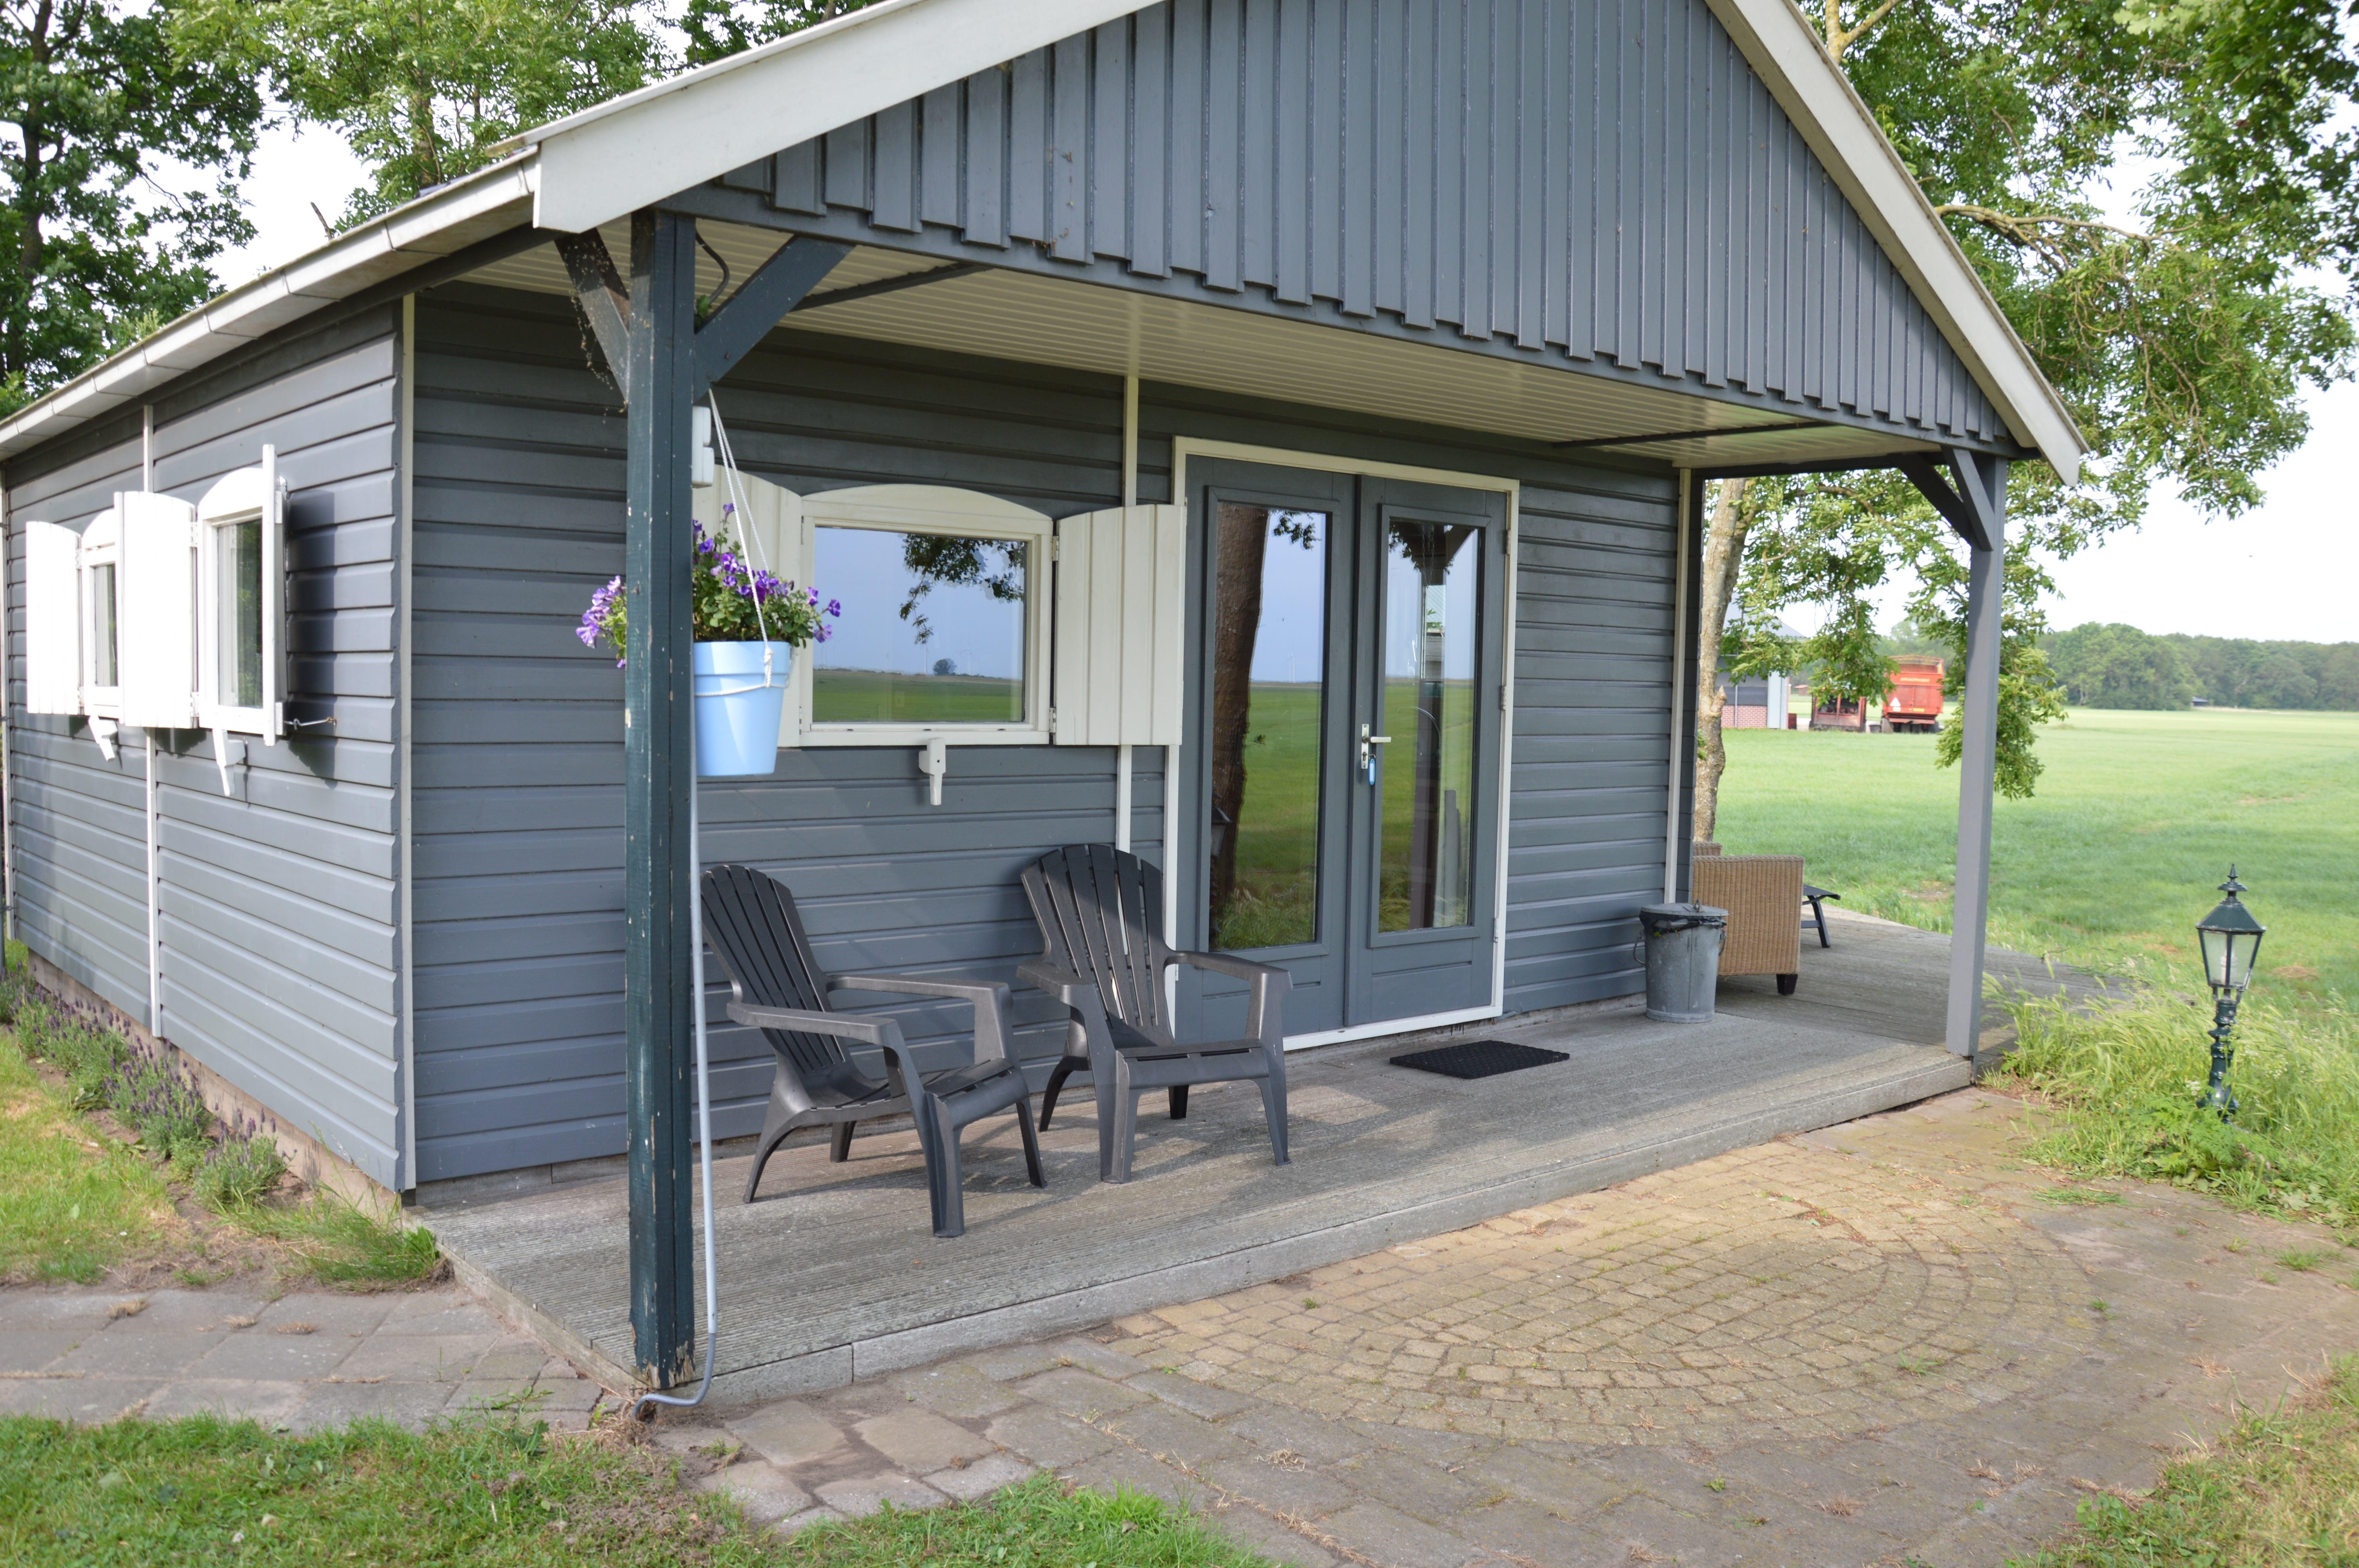 Lyklamastate_Bed_&_Breakfast_Hotel_Overnachten_Boerderij_Friesland_Noord_Nederland_Chalet